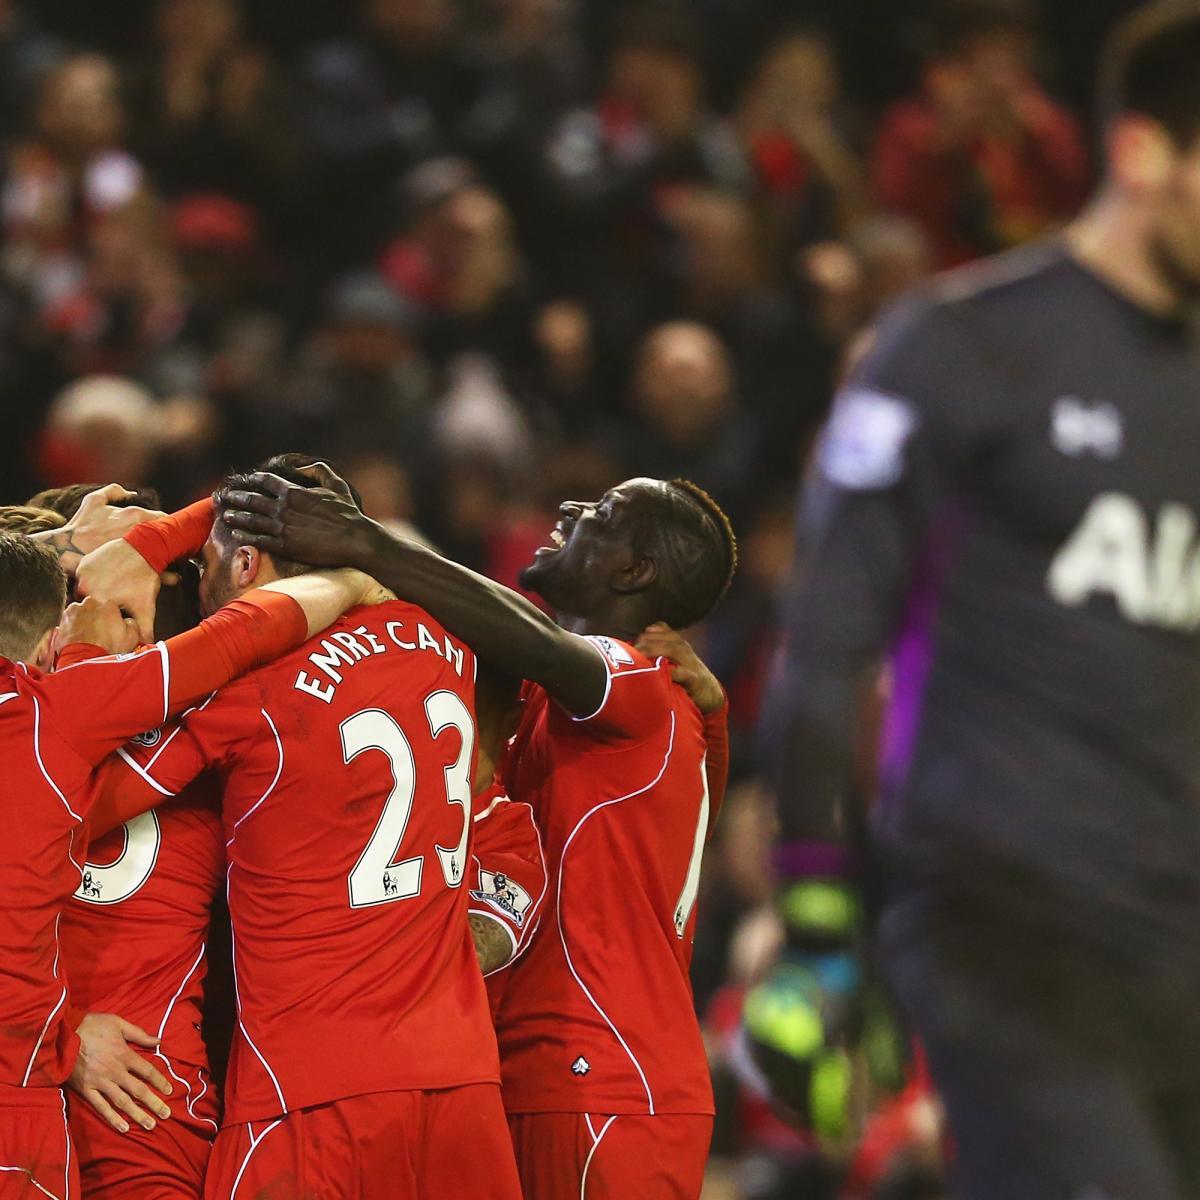 Tottenham 3 Fulham 1 Match Highlights Harry Kane Scores: Best Twitter Reaction To Liverpool Vs. Tottenham Hotspur